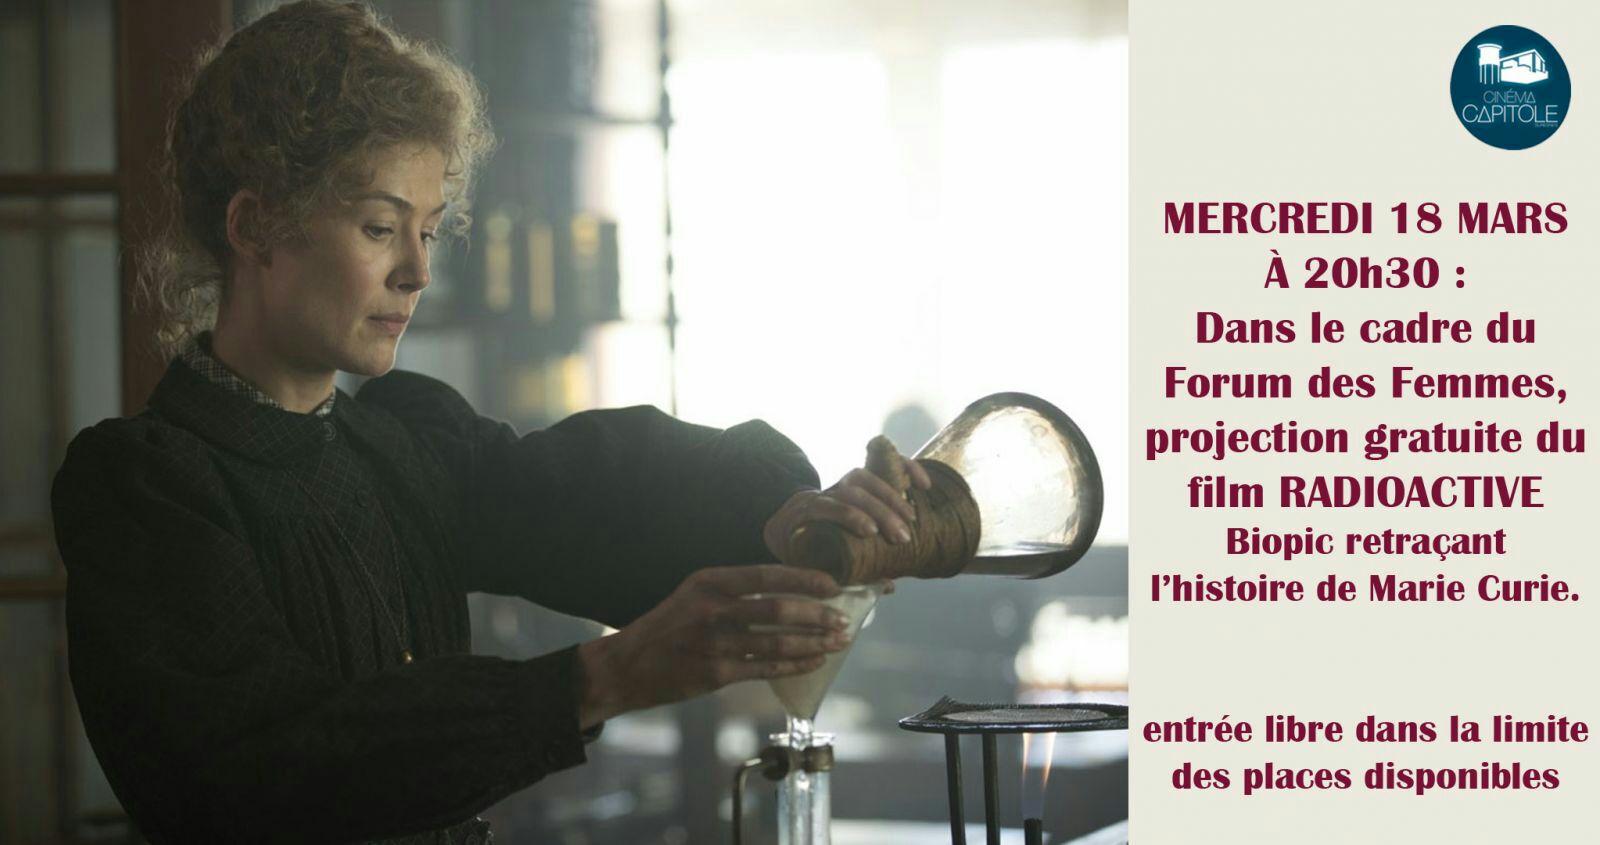 Projection gratuite du film Radioactive le 18 mars - Cinema Capitole Suresnes (92)